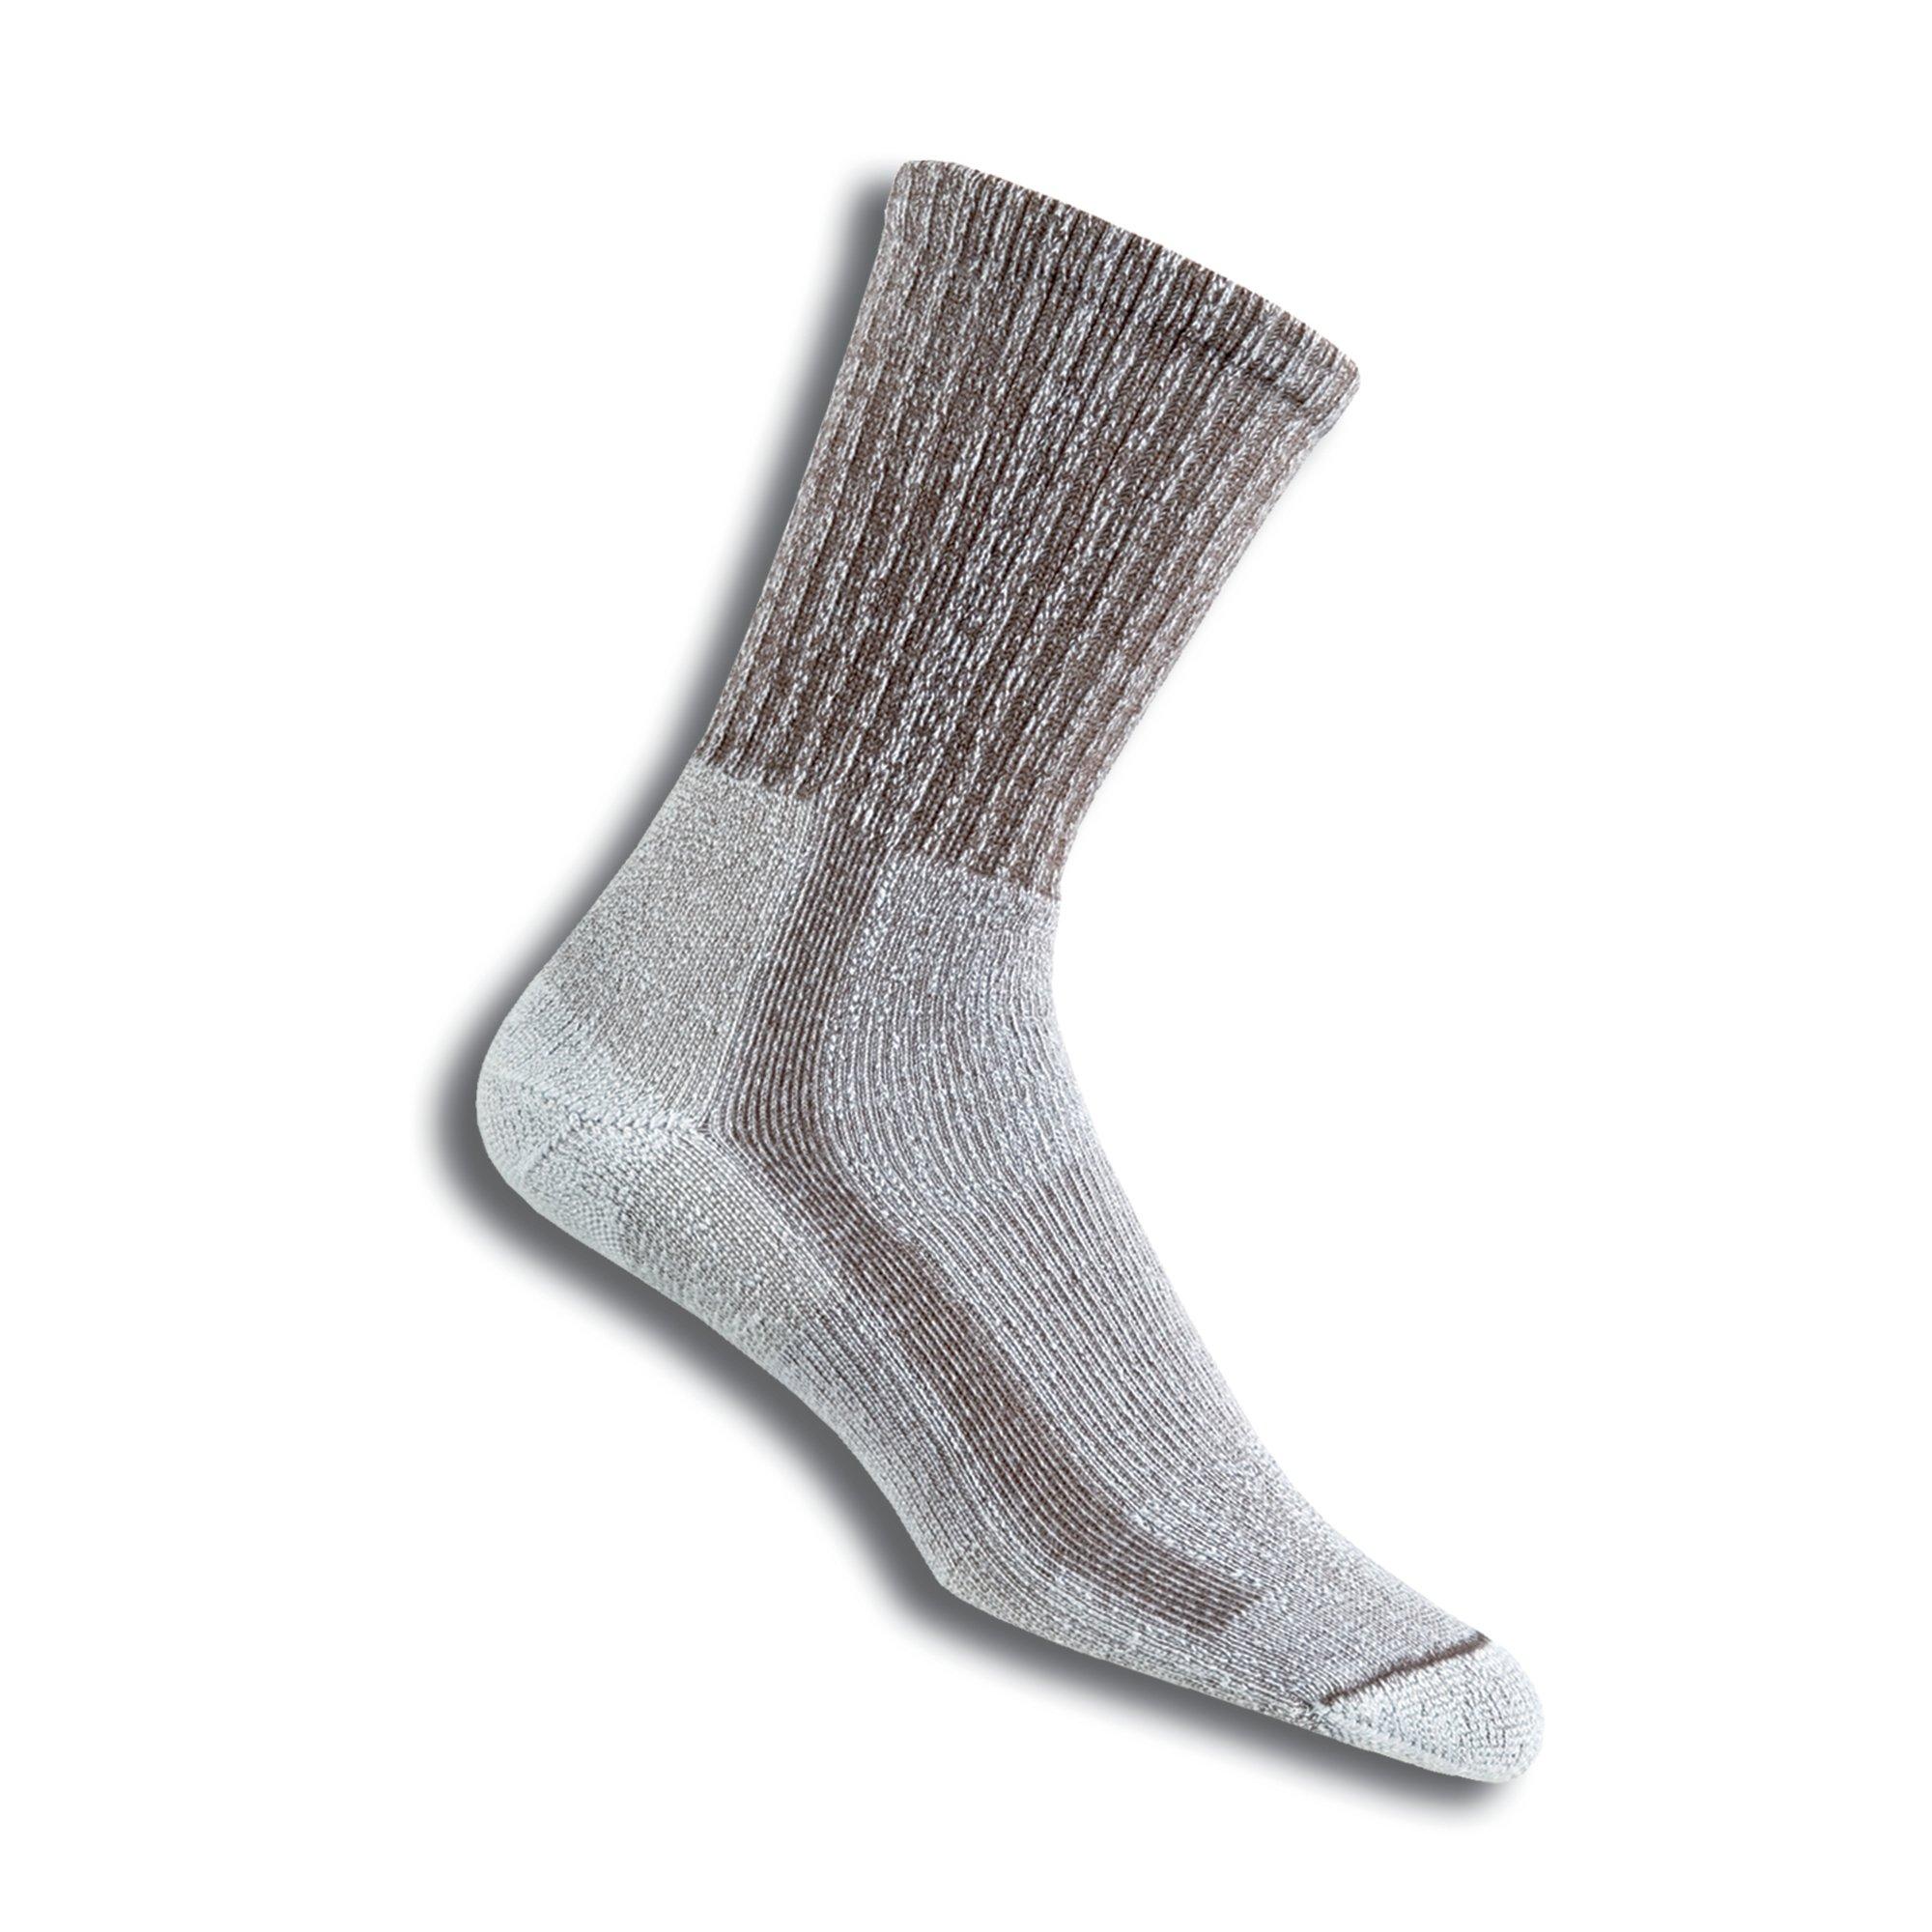 ead86c82586 Best Rated in Men s Hiking Socks   Helpful Customer Reviews - Amazon.com